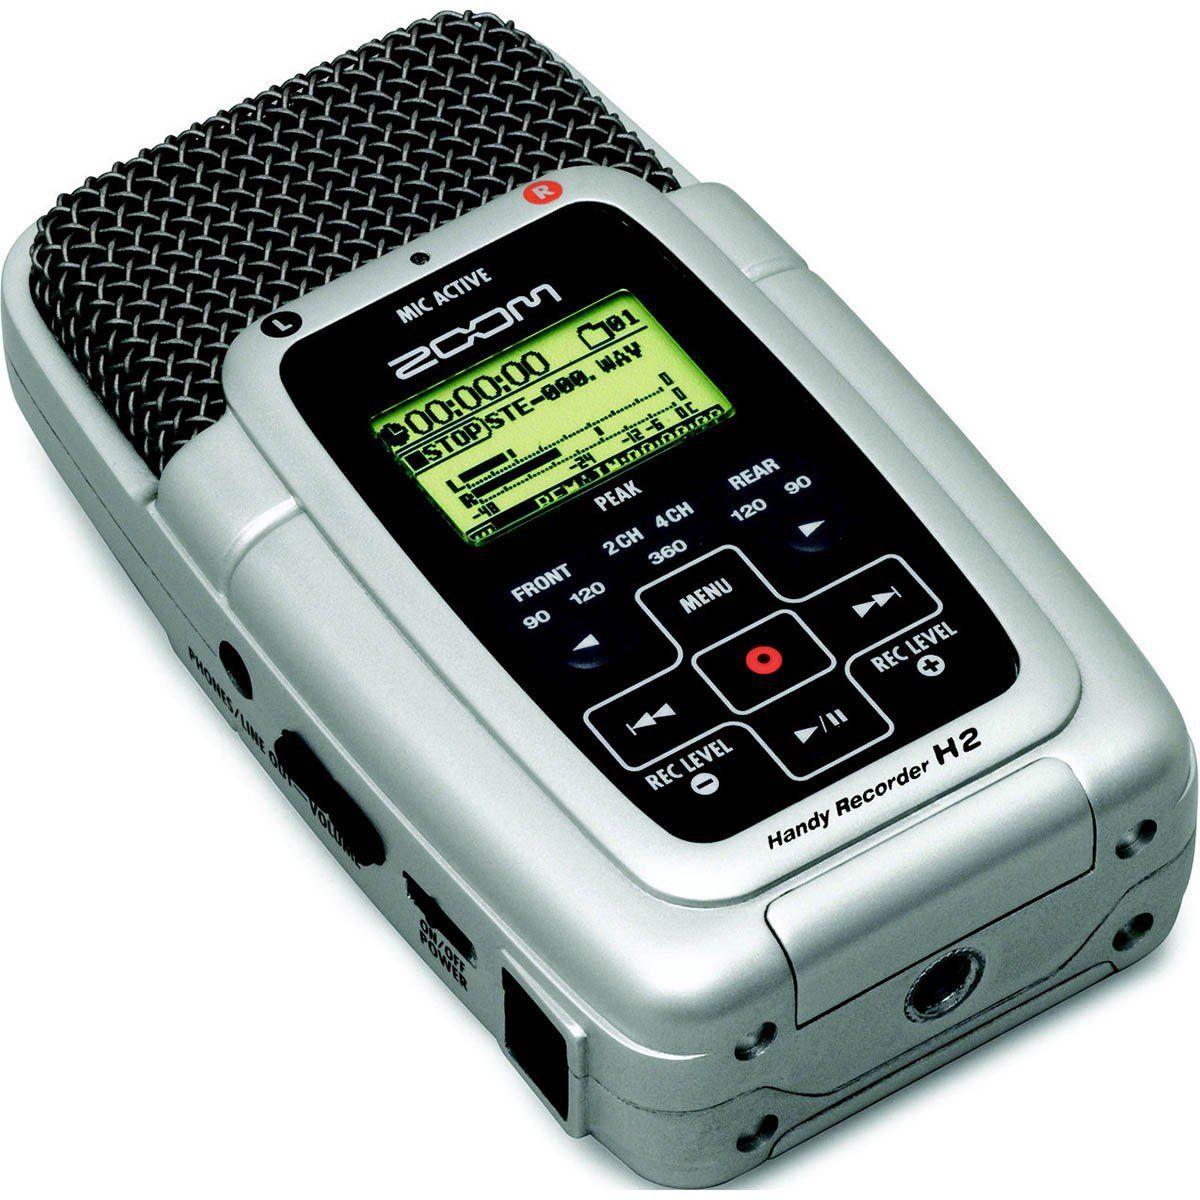 Zoom H2 Gravador De Audio Zoom H-2 Usb 1GB 4 Microfones 24-Bit 96-Khz até 32GB